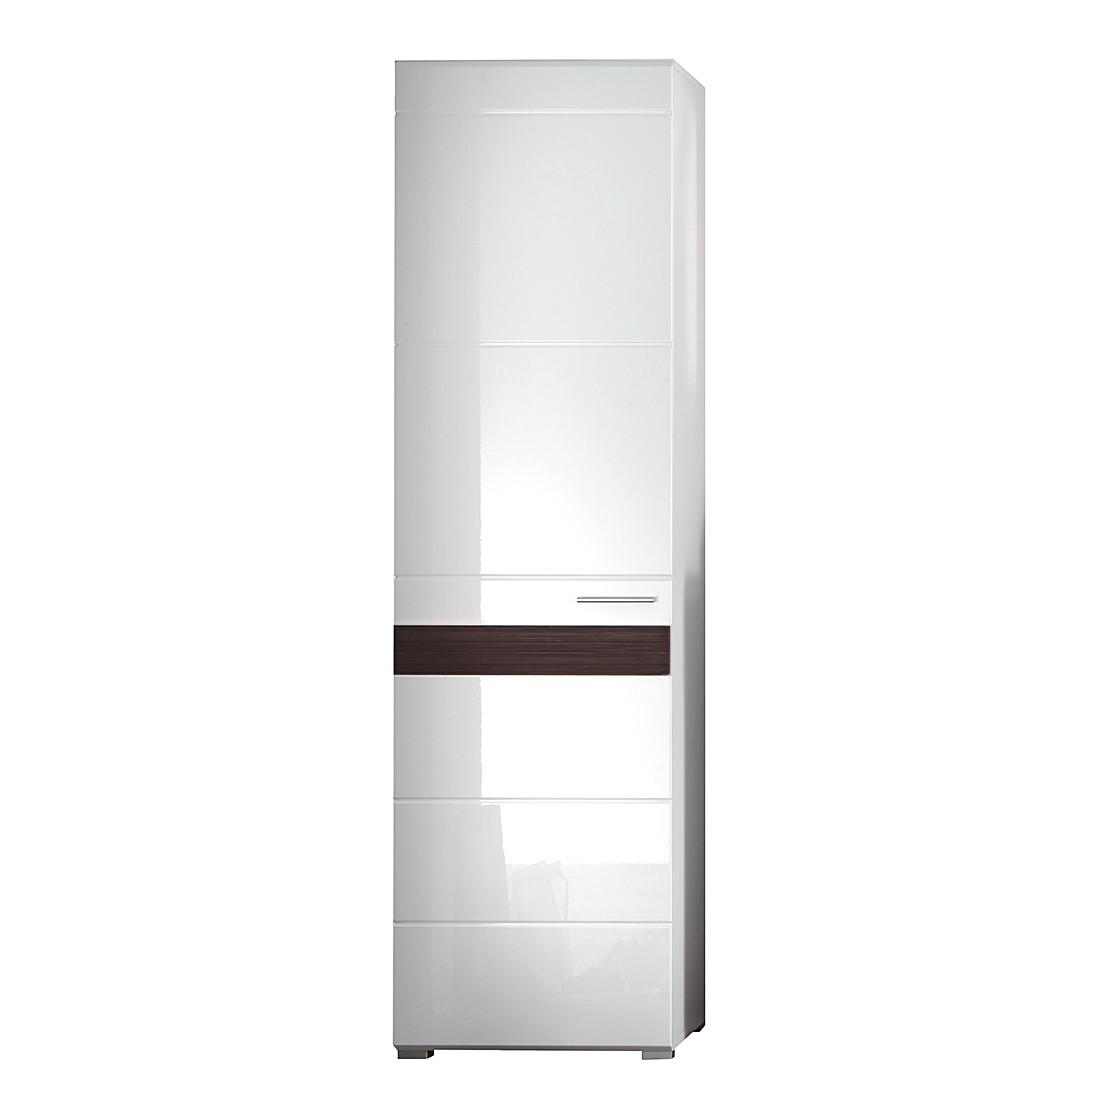 Armoire de vestibule Baku - Blanc brillant / Imitation chêne foncé, Trendteam